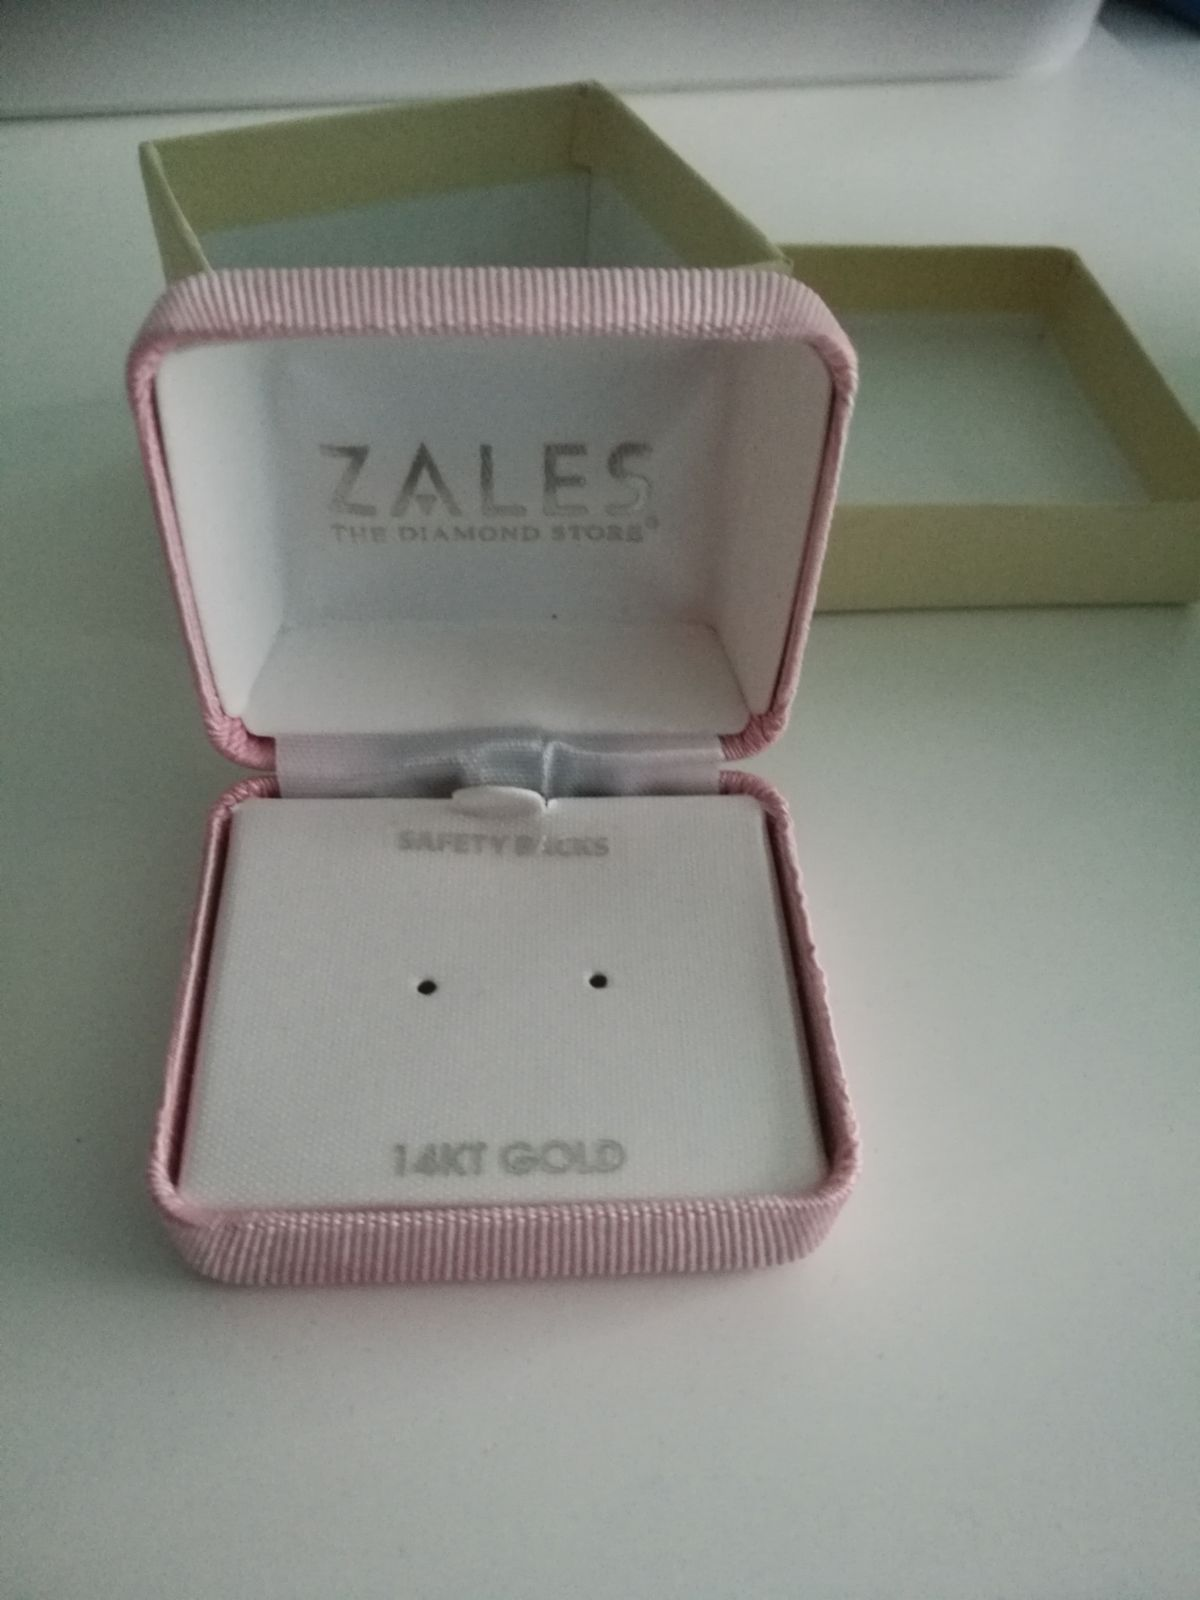 Zales Earstuds Earring Gift Box Pink Mercari Things